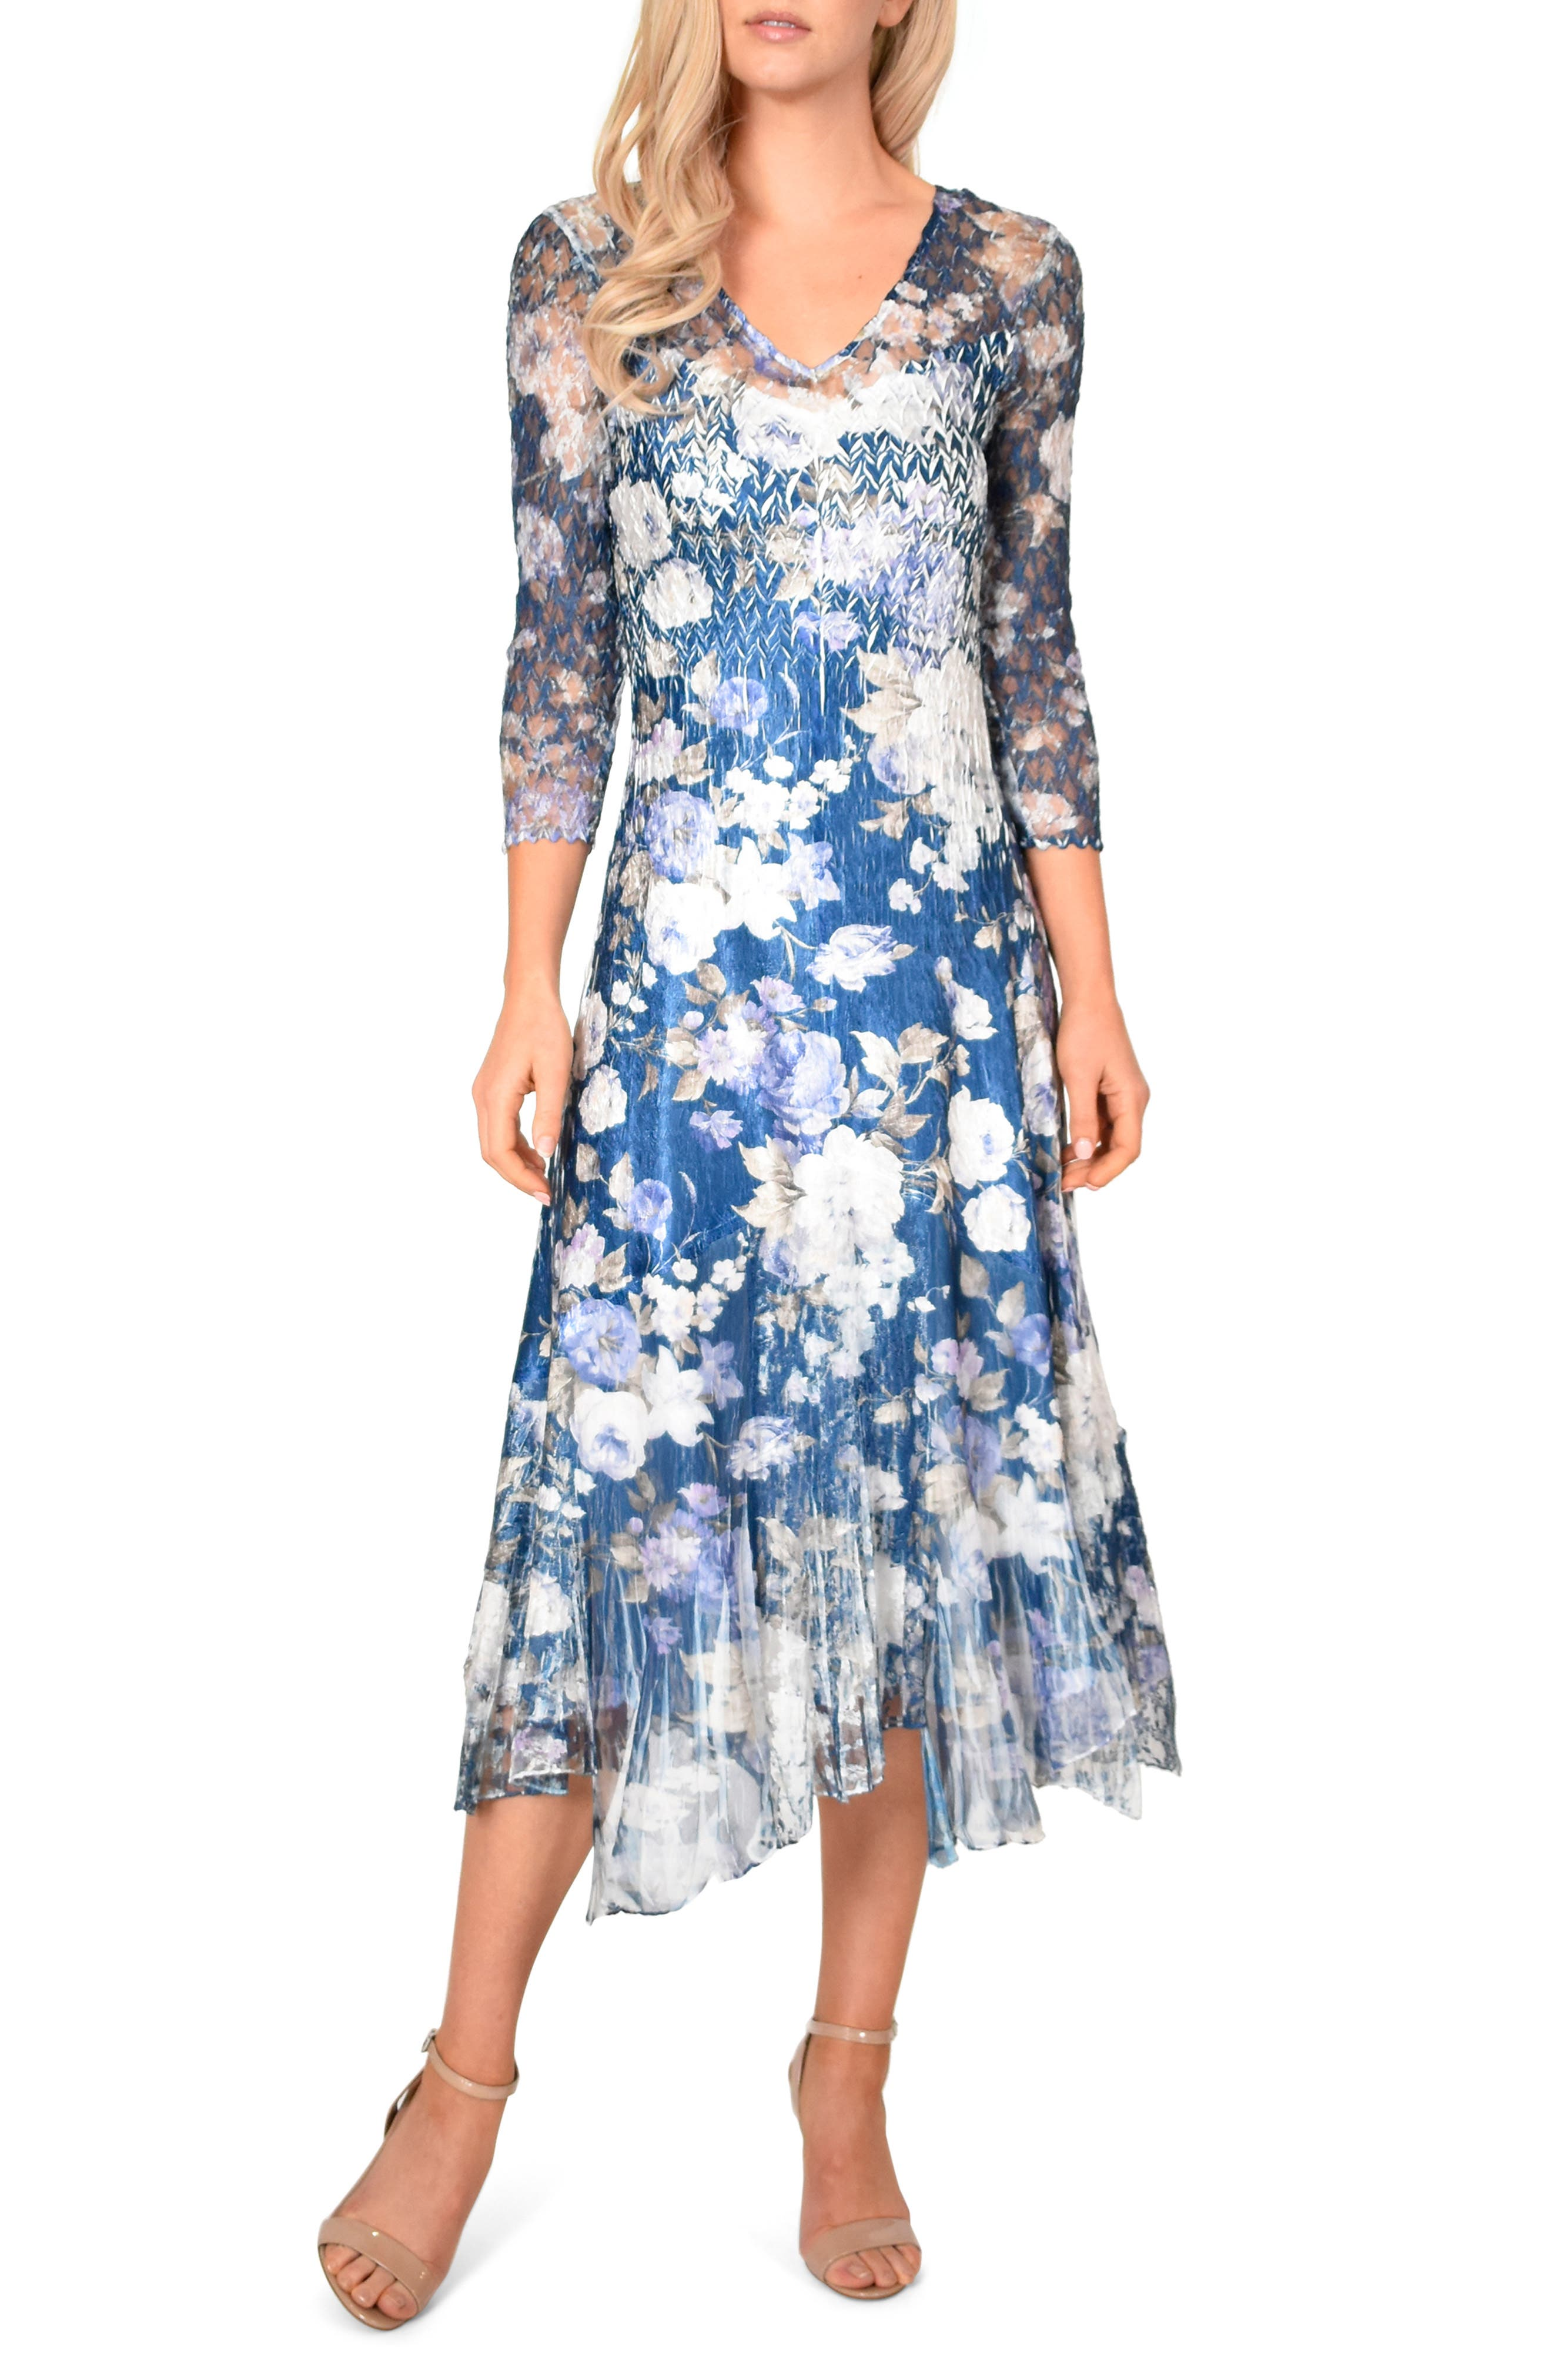 KOMAROV Floral Charmeuse & Chiffon Dress, Main, color, OLENADER NIGHT